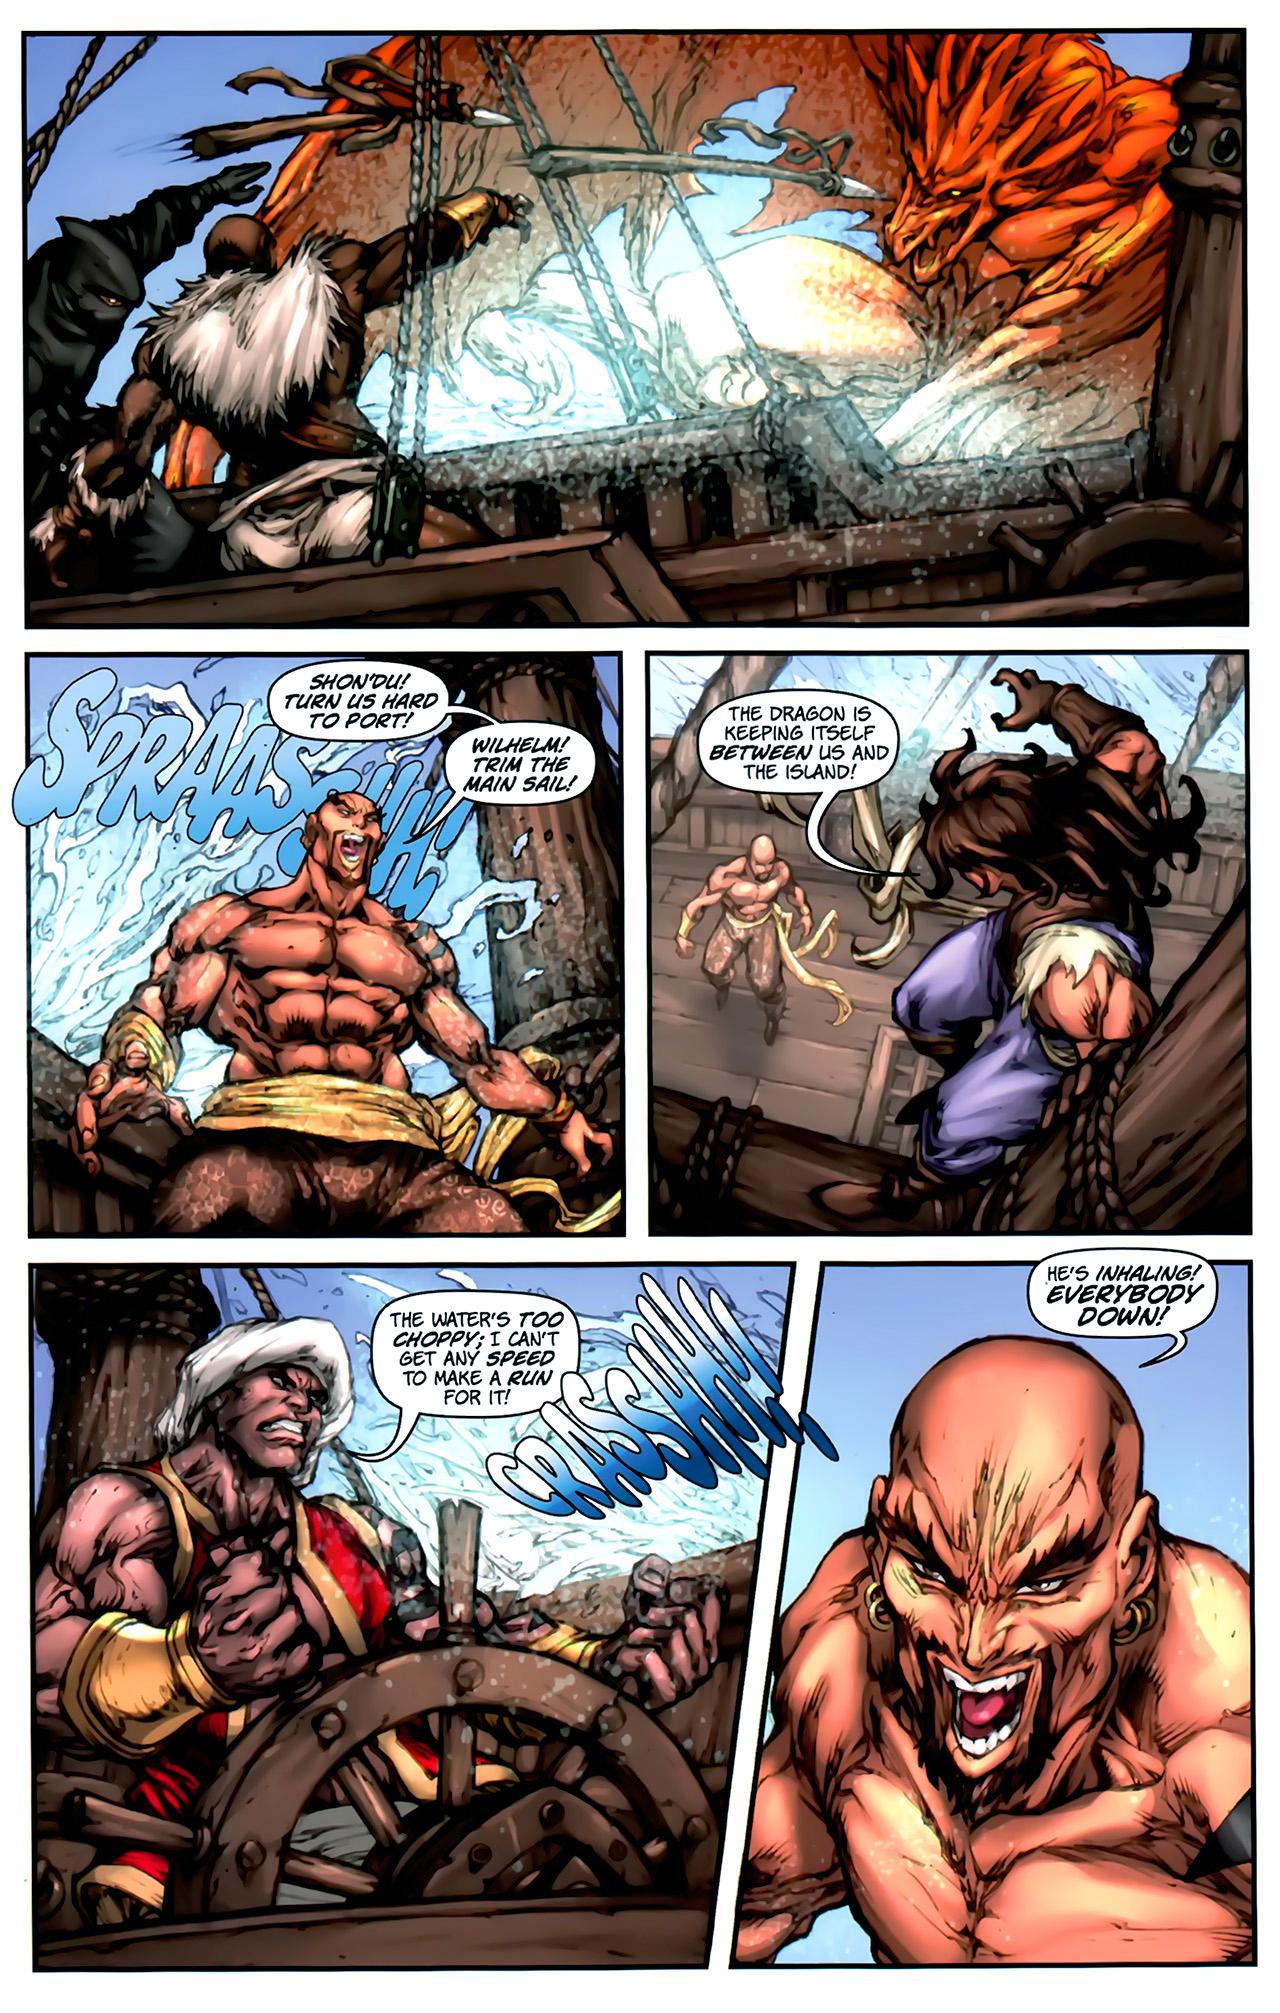 Read online 1001 Arabian Nights: The Adventures of Sinbad comic -  Issue #2 - 22